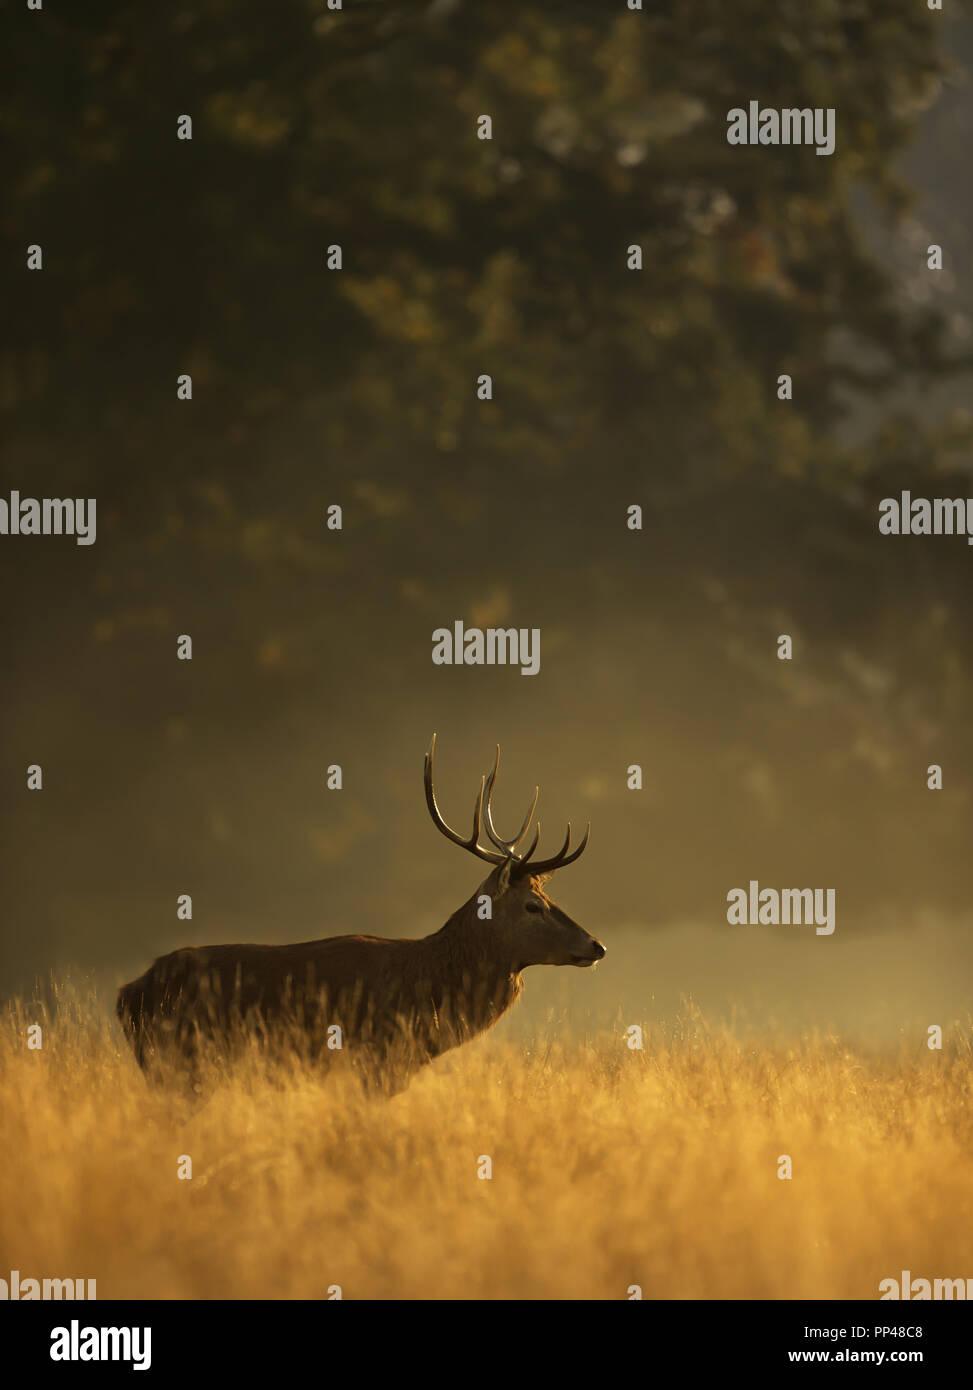 Red Deer Stag at sunrise, UK. Immagini Stock